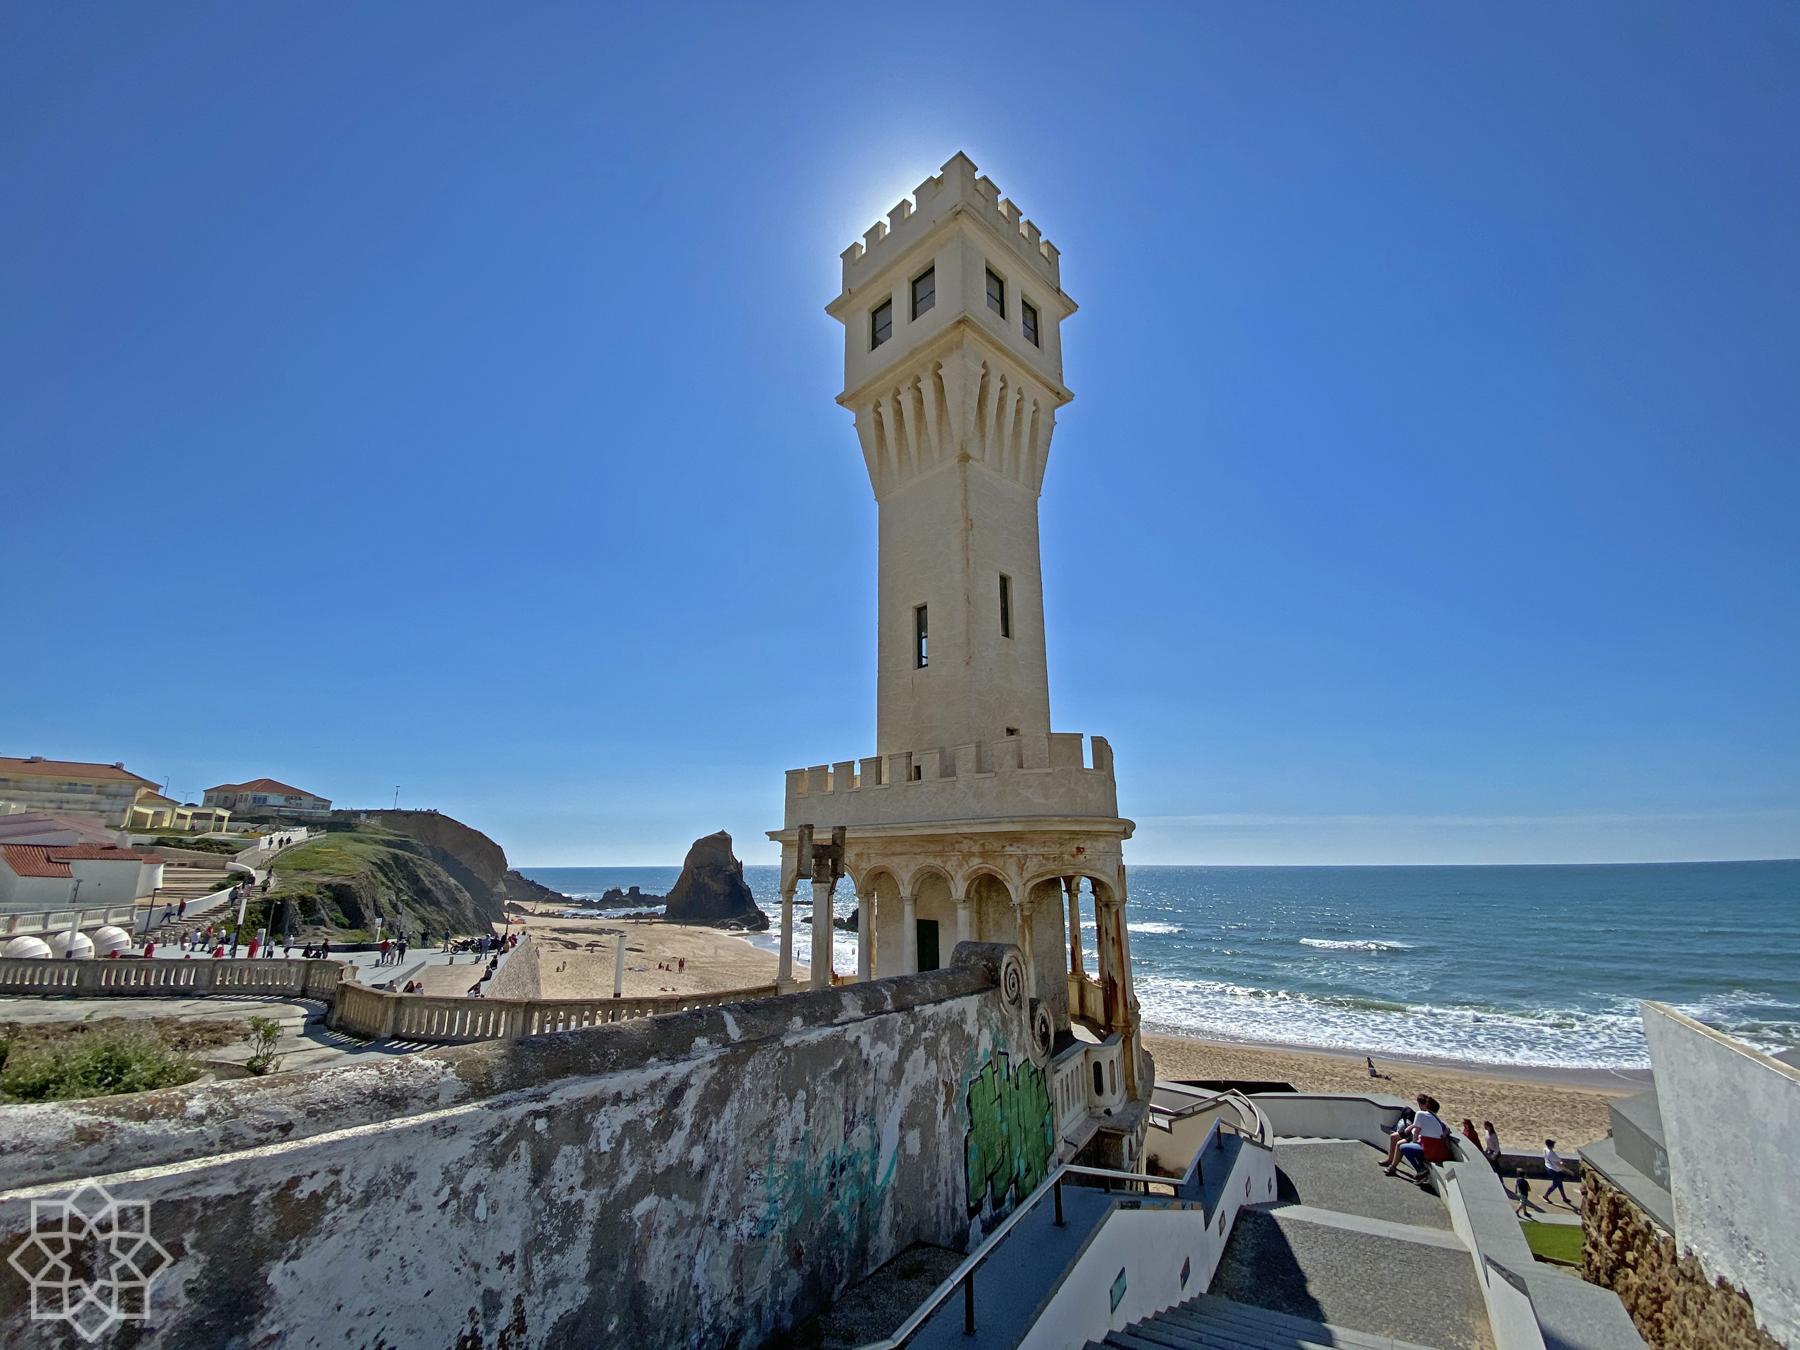 Torre de Santa Cruz